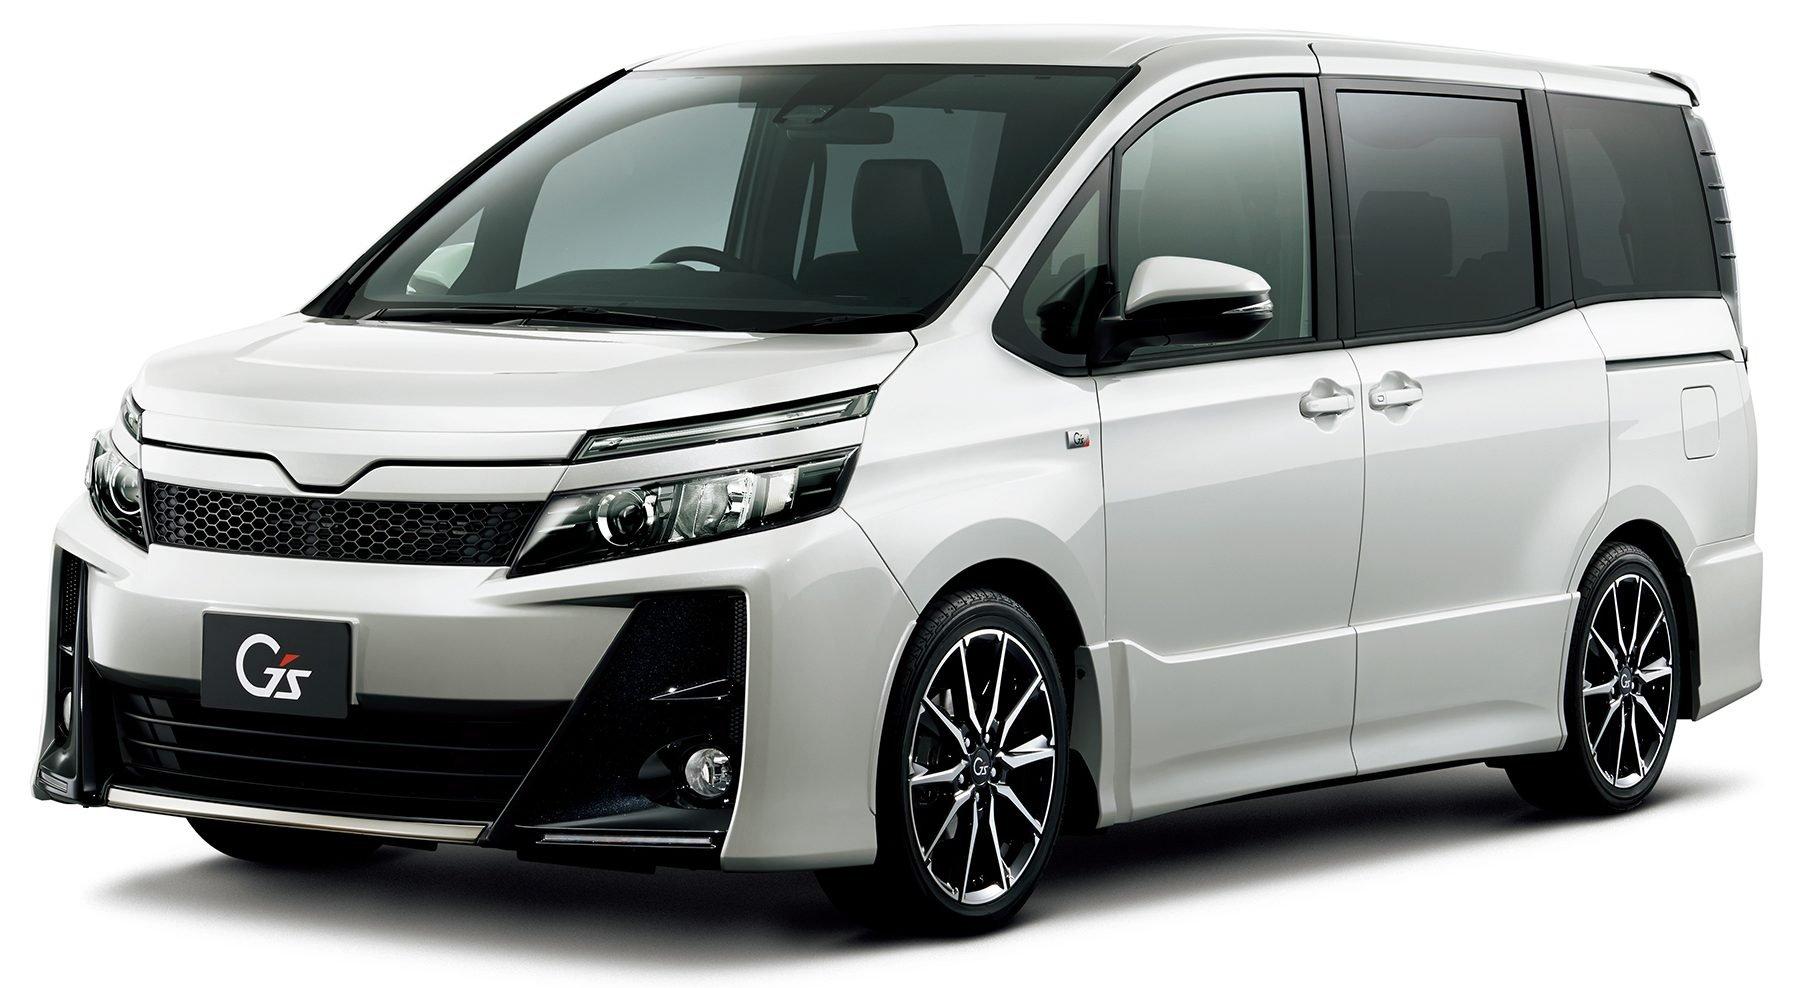 Toyota Noah and Voxy get Gazoo Racing G's treatment